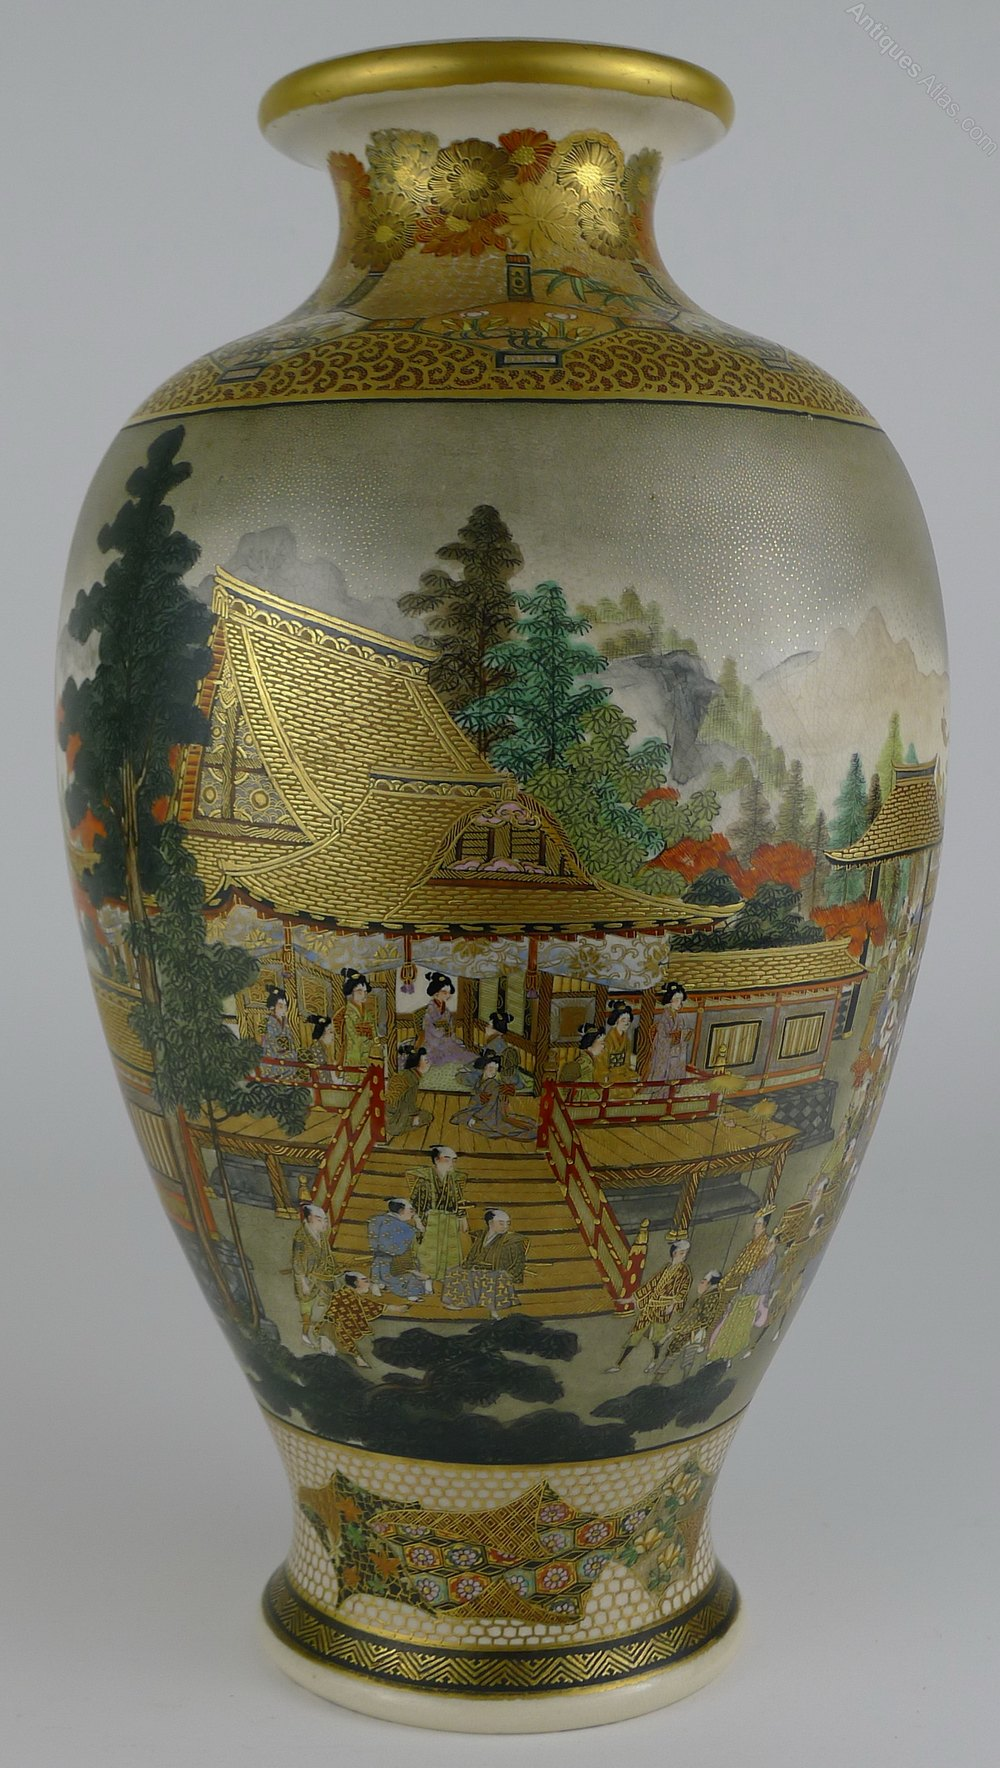 Antiques atlas fine quality 19th c japanese satsuma vase hozan fine quality 19th c japanese satsuma vase hozan reviewsmspy